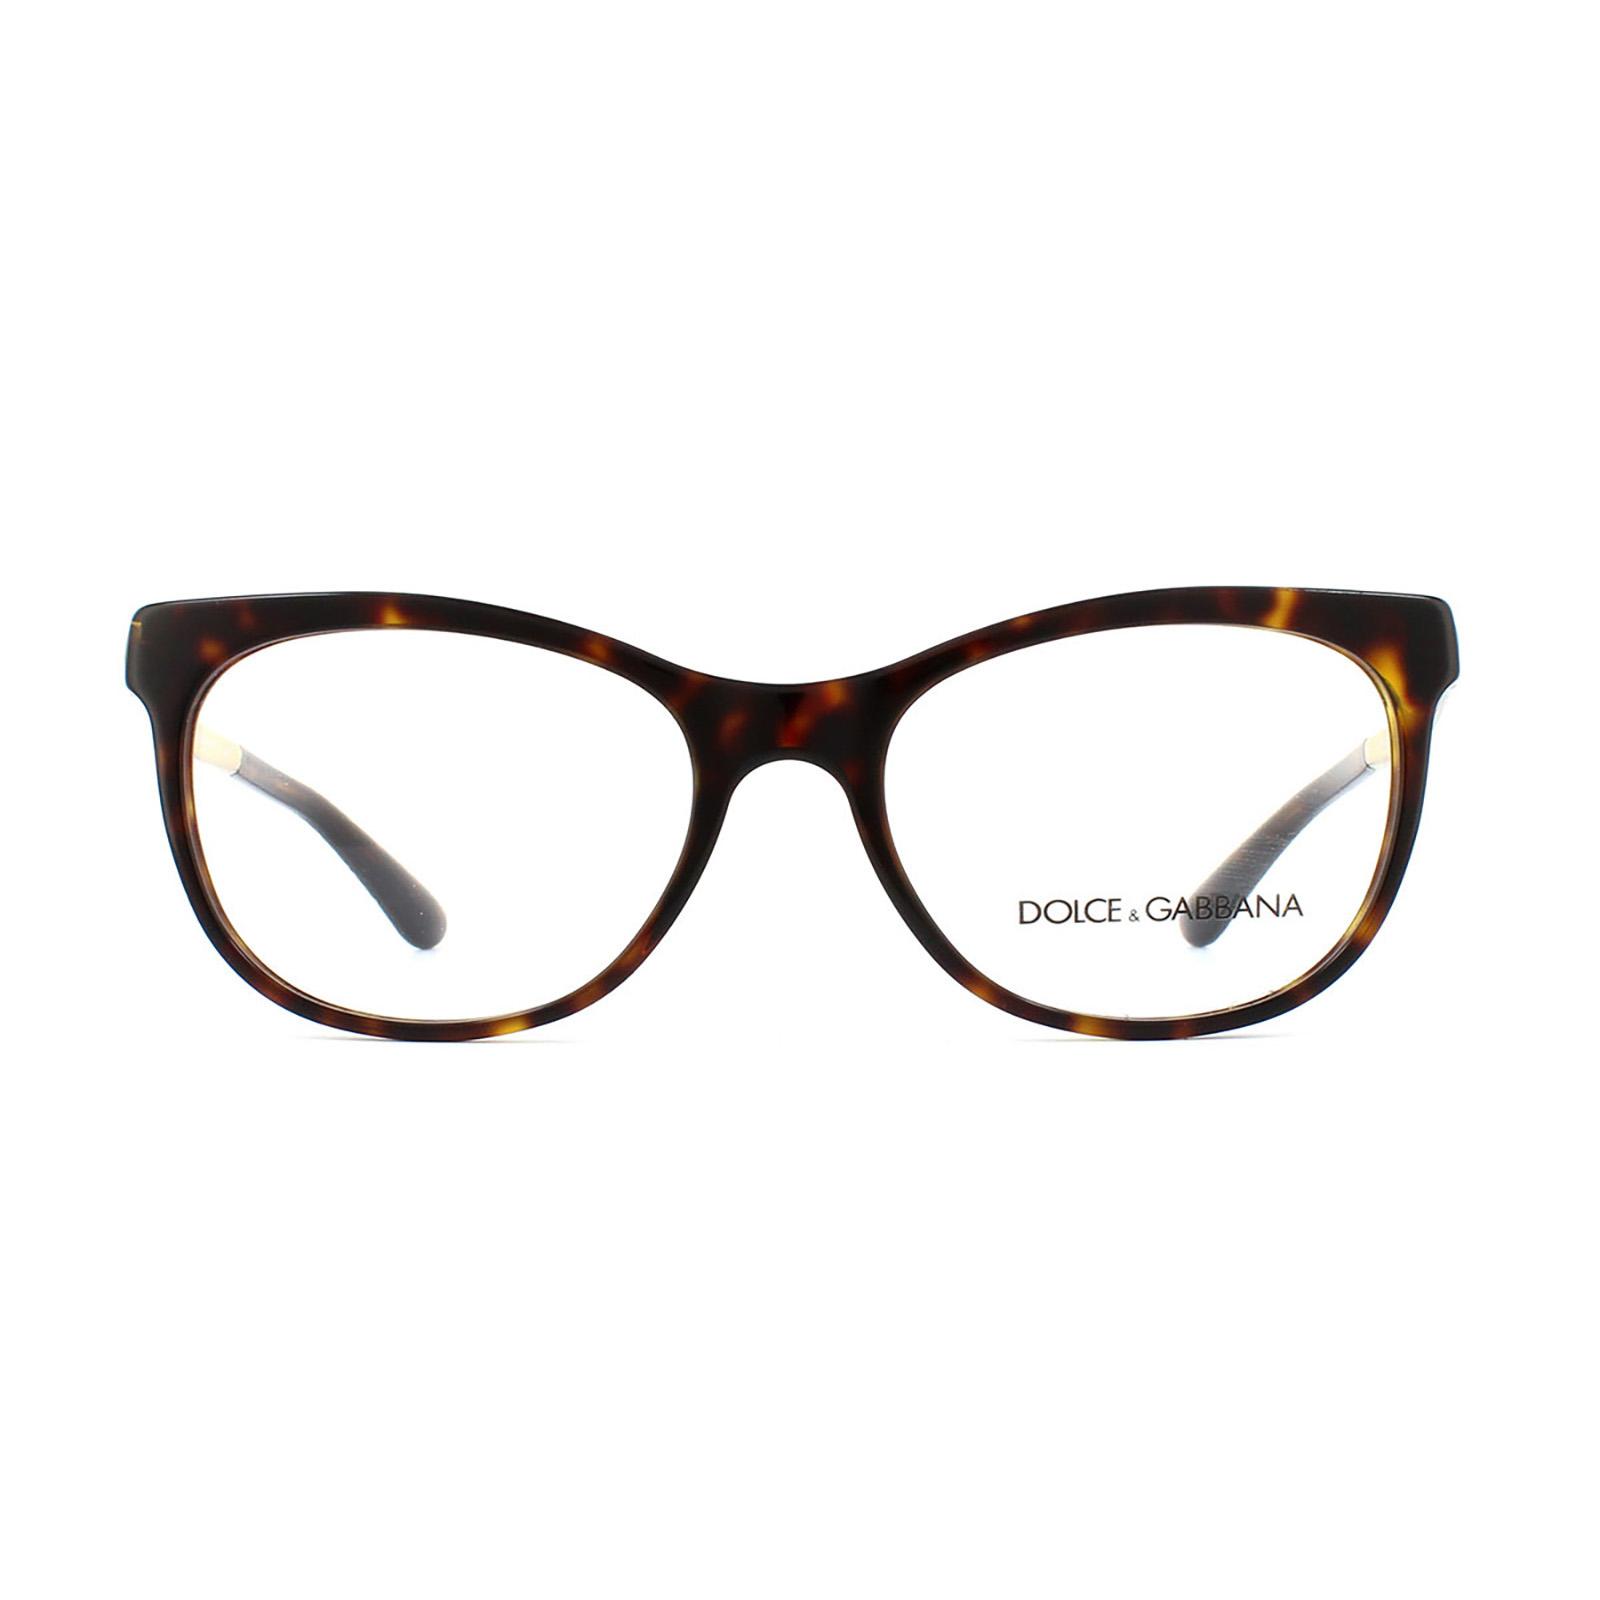 Dolce and Gabbana Glasses Frames 3234 502 Dark Havana Womens 54mm | eBay